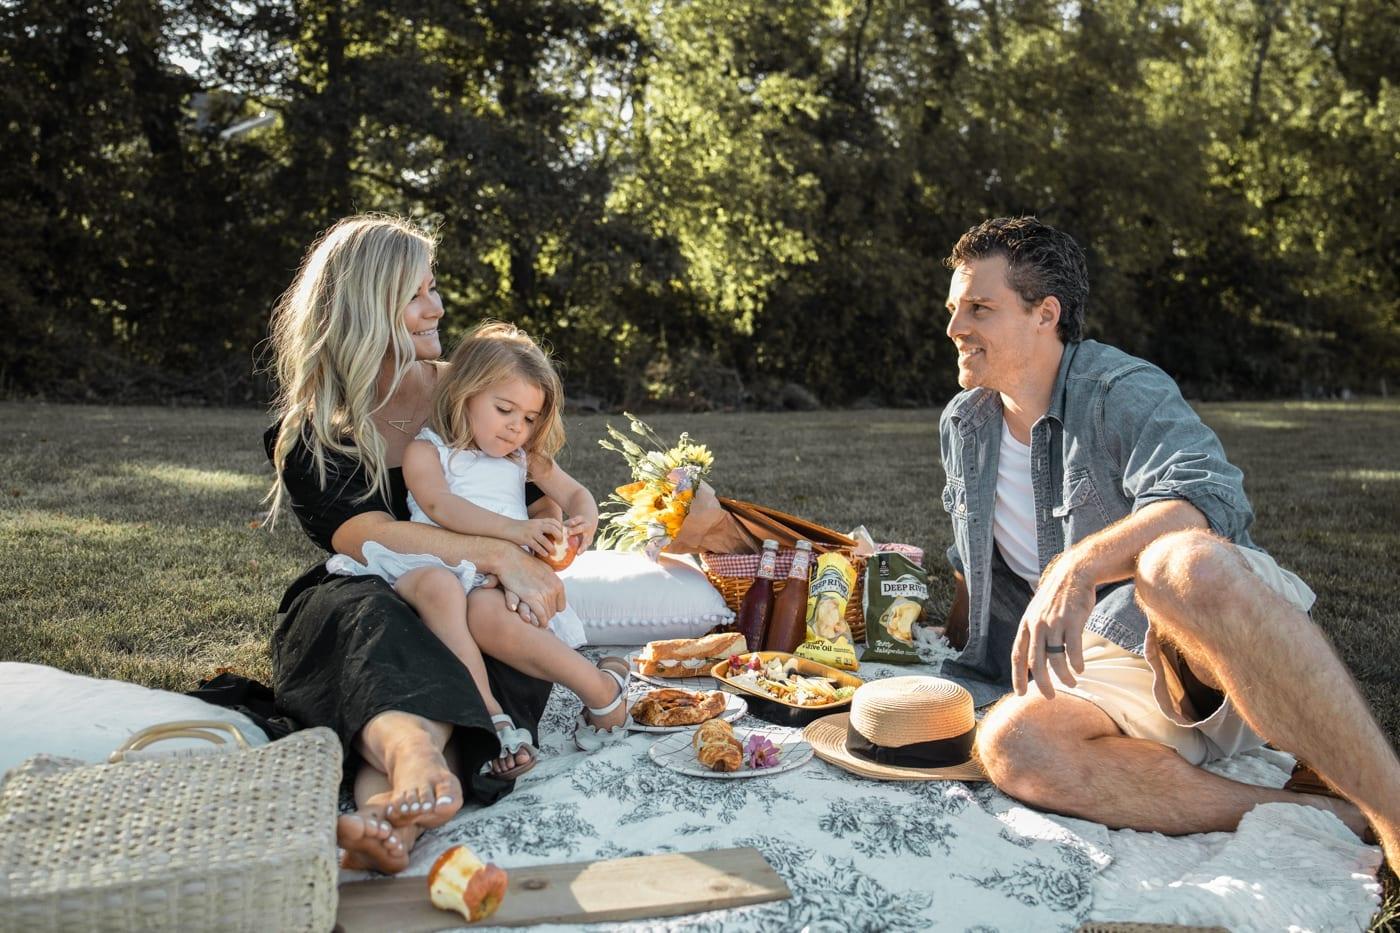 Dining Al Fresco - Mediterra Cafe- Pittsburgh- Ashley Pletcher- Family Picnic-